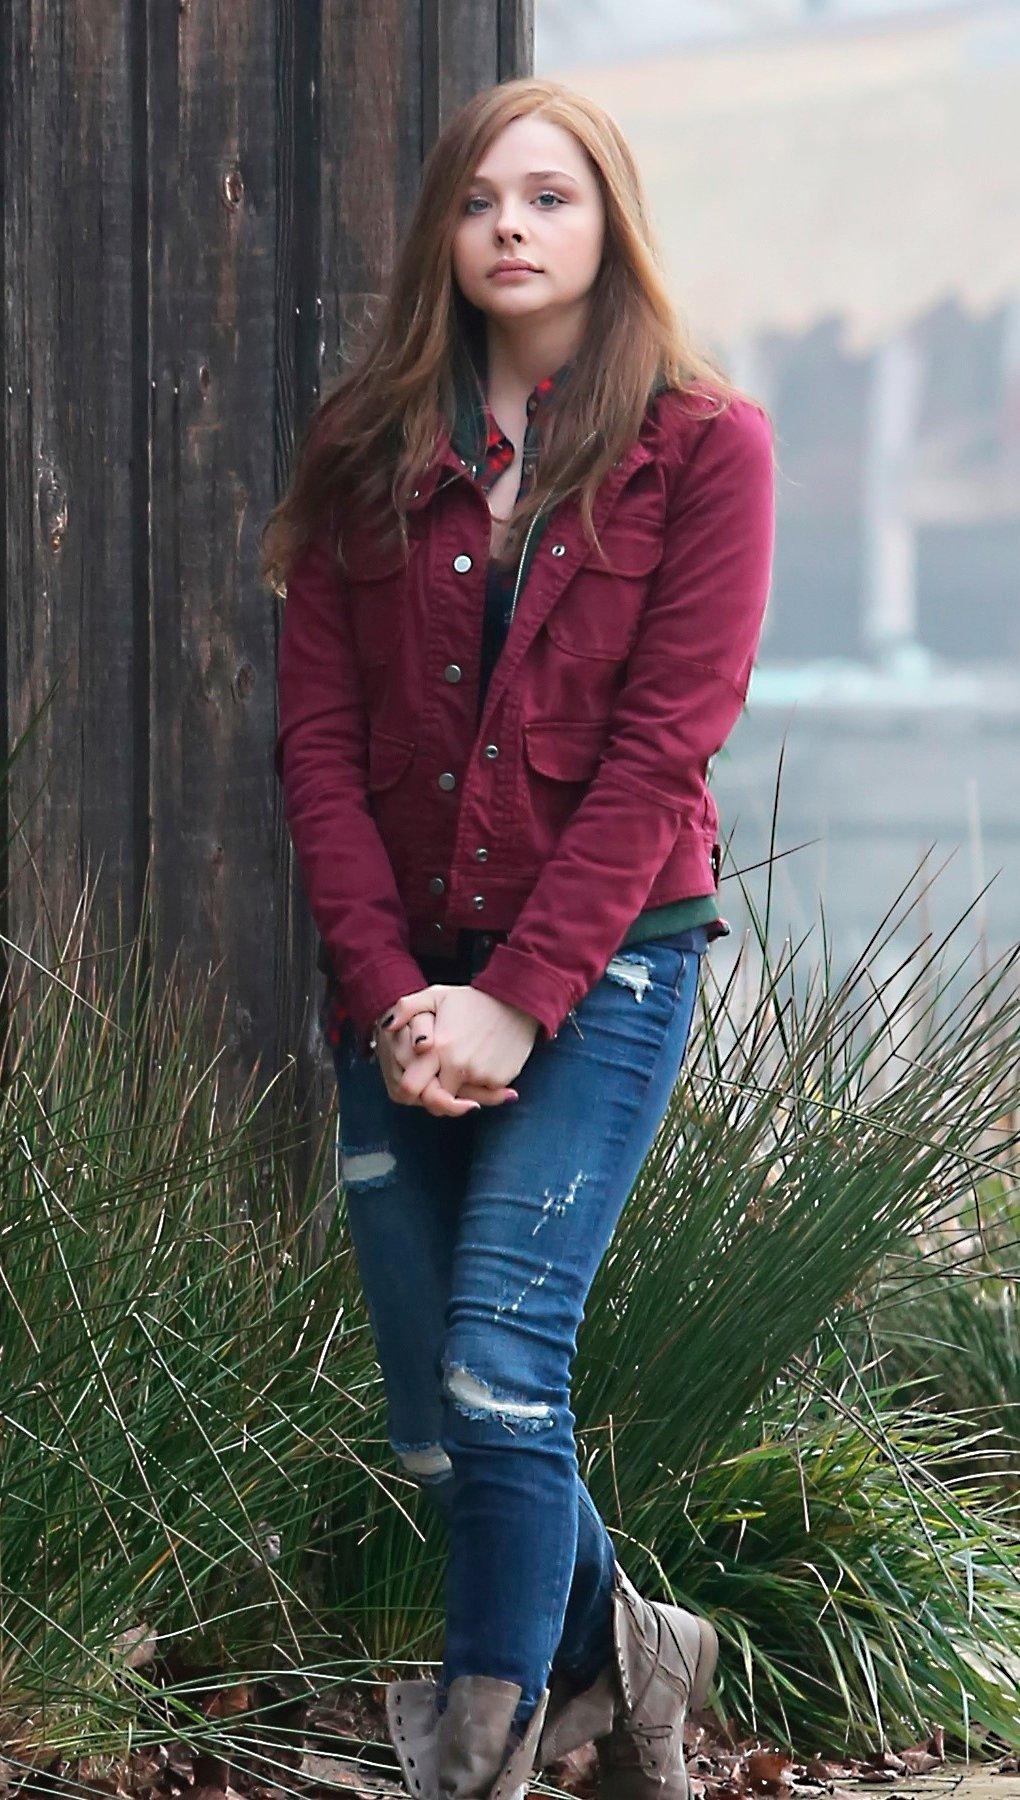 Fondos de pantalla Chloe Moretz en Si decido quedarme Vertical